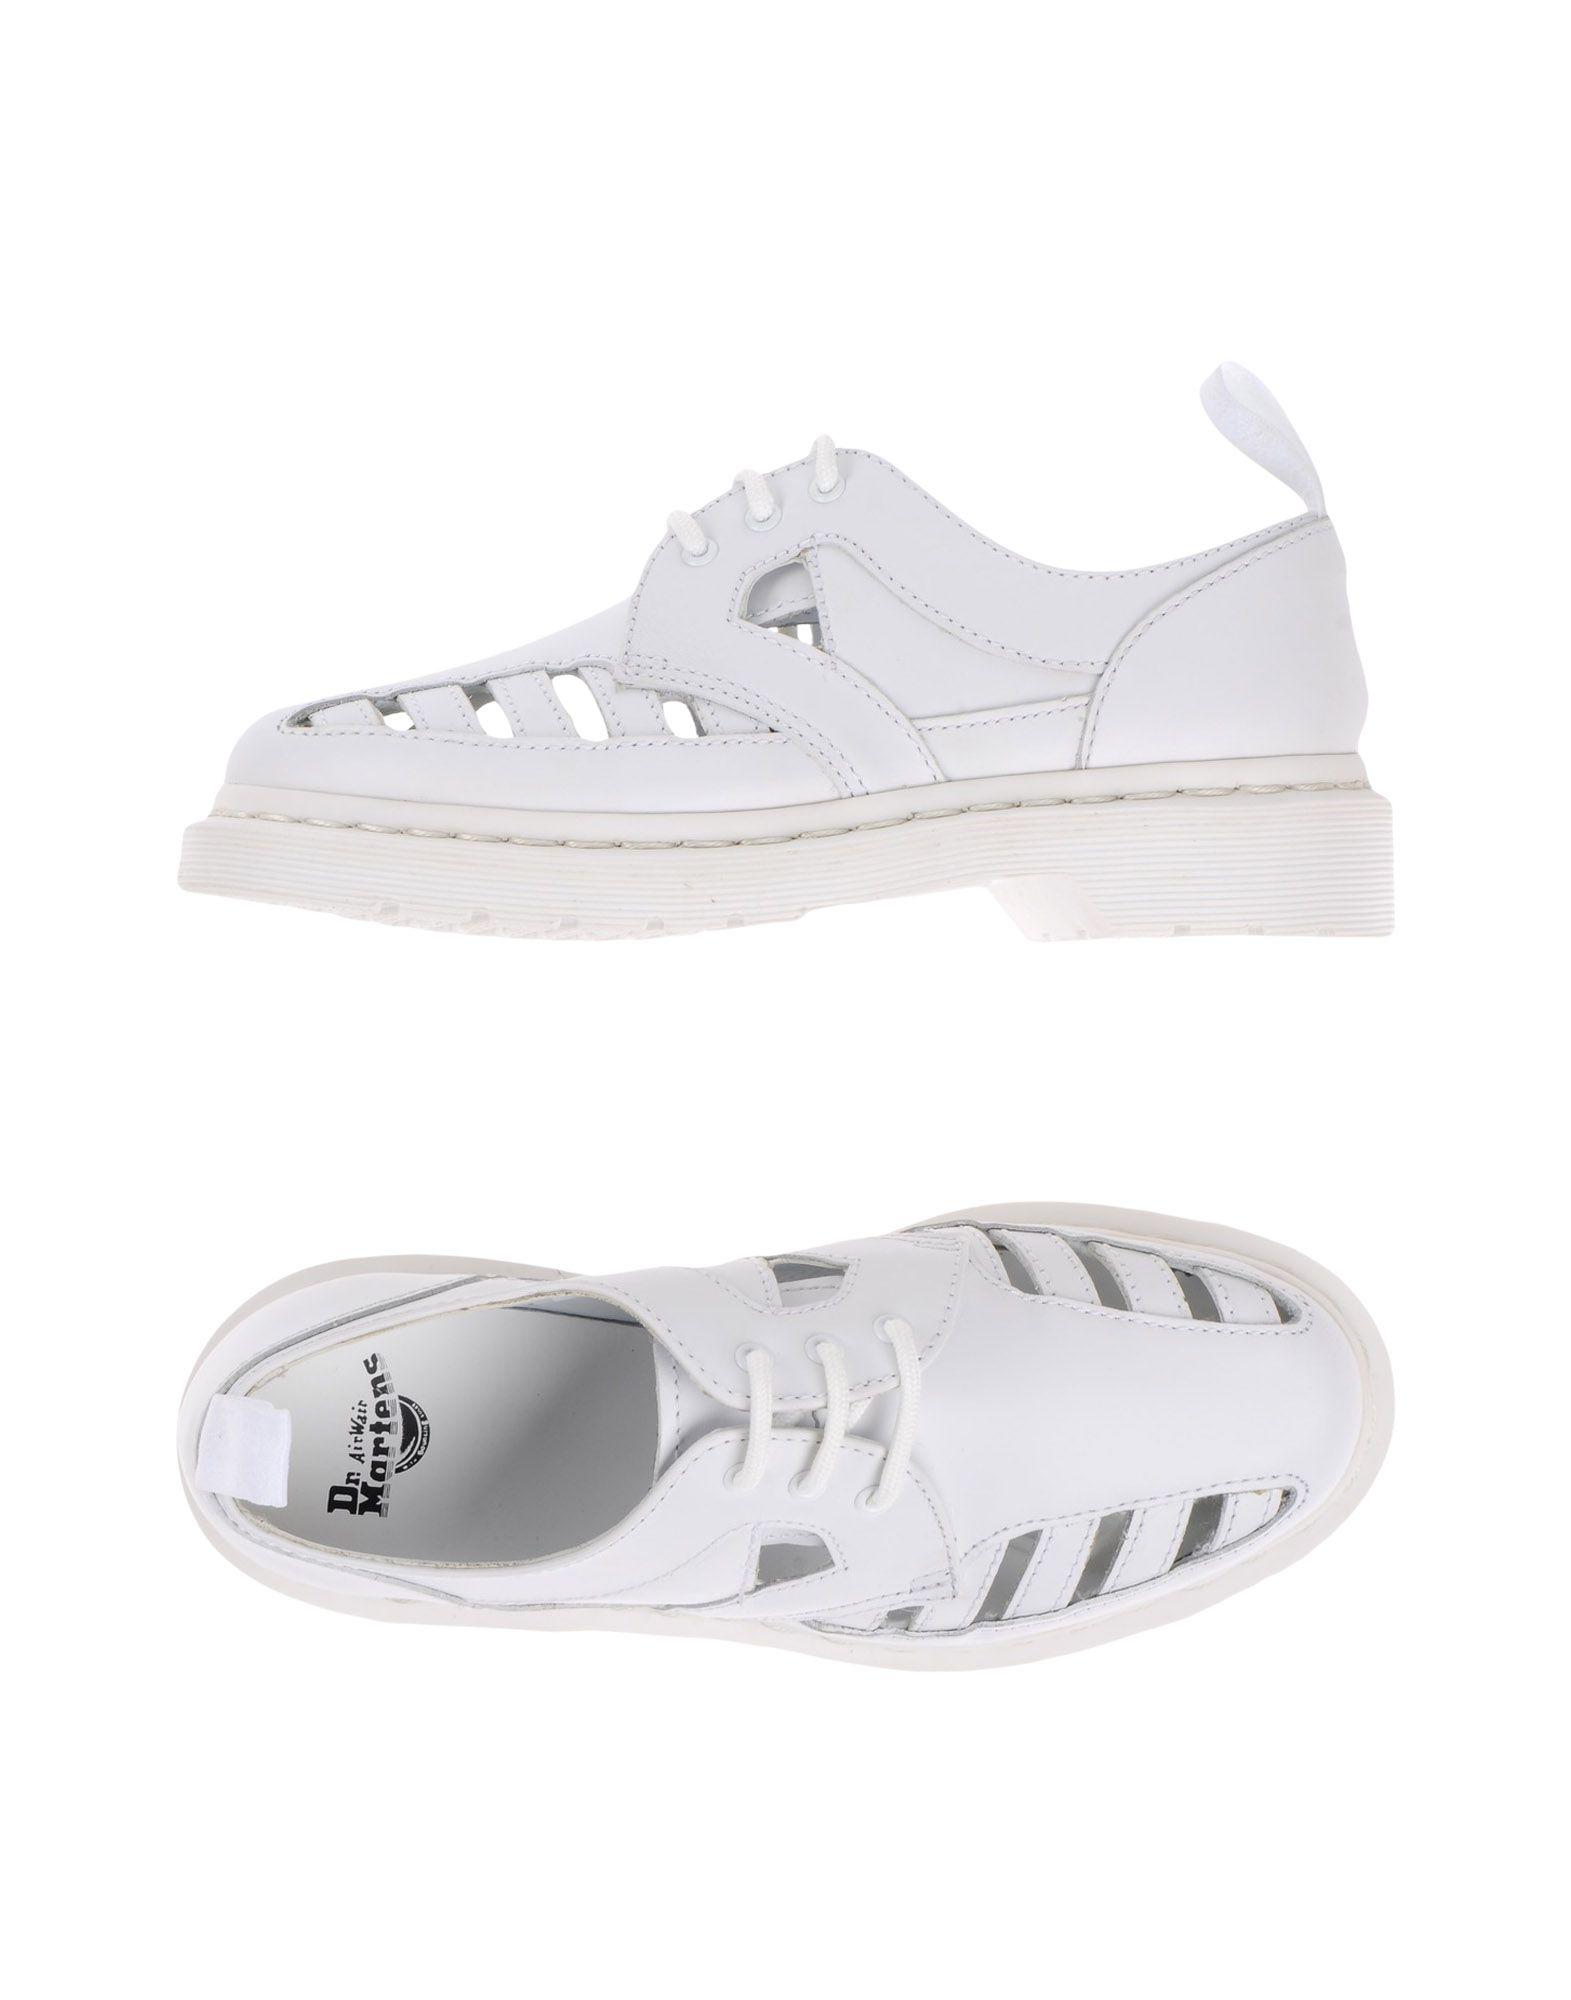 Dr. Martens Schnürschuhe Damen  11342555QH Gute Qualität beliebte Schuhe